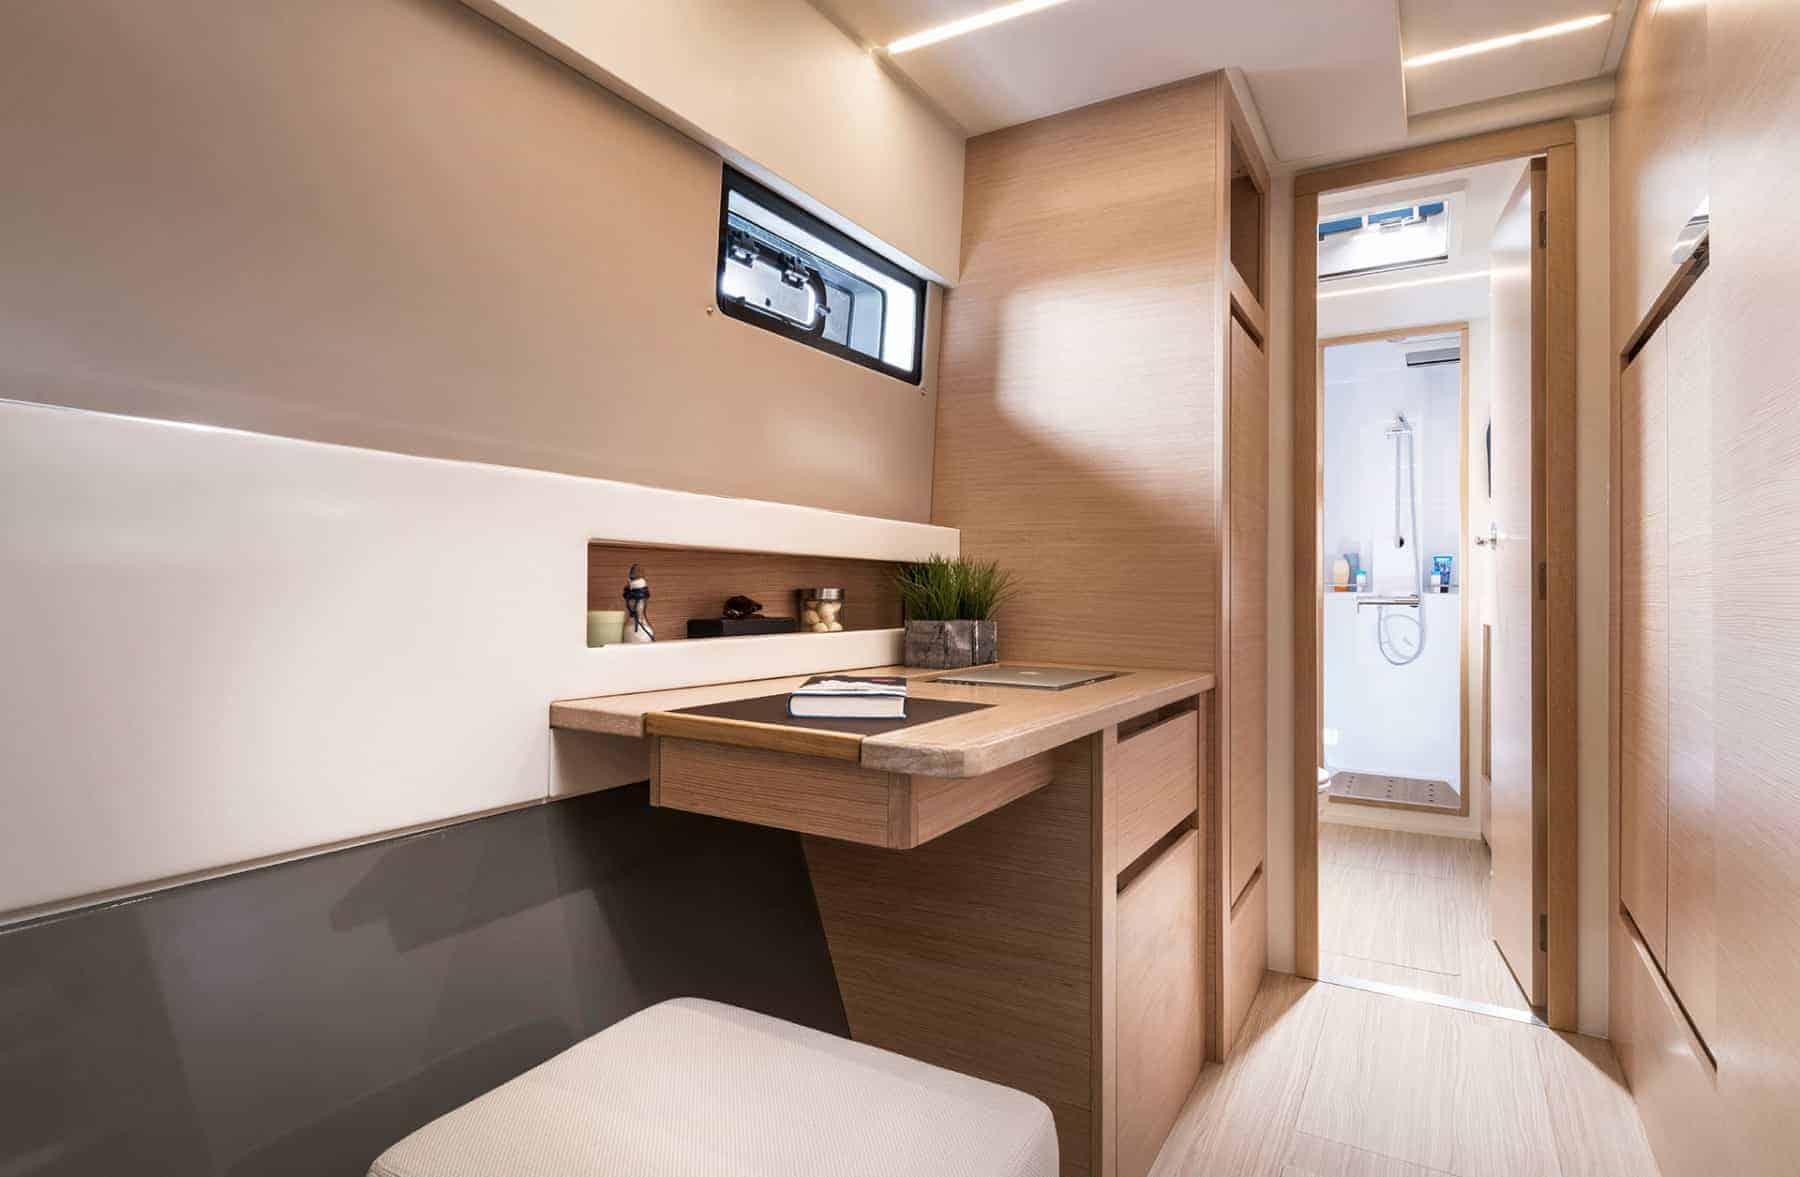 Bavaria-Nautitech-40-open-interior-cabin-3-charter-ownership-yacht